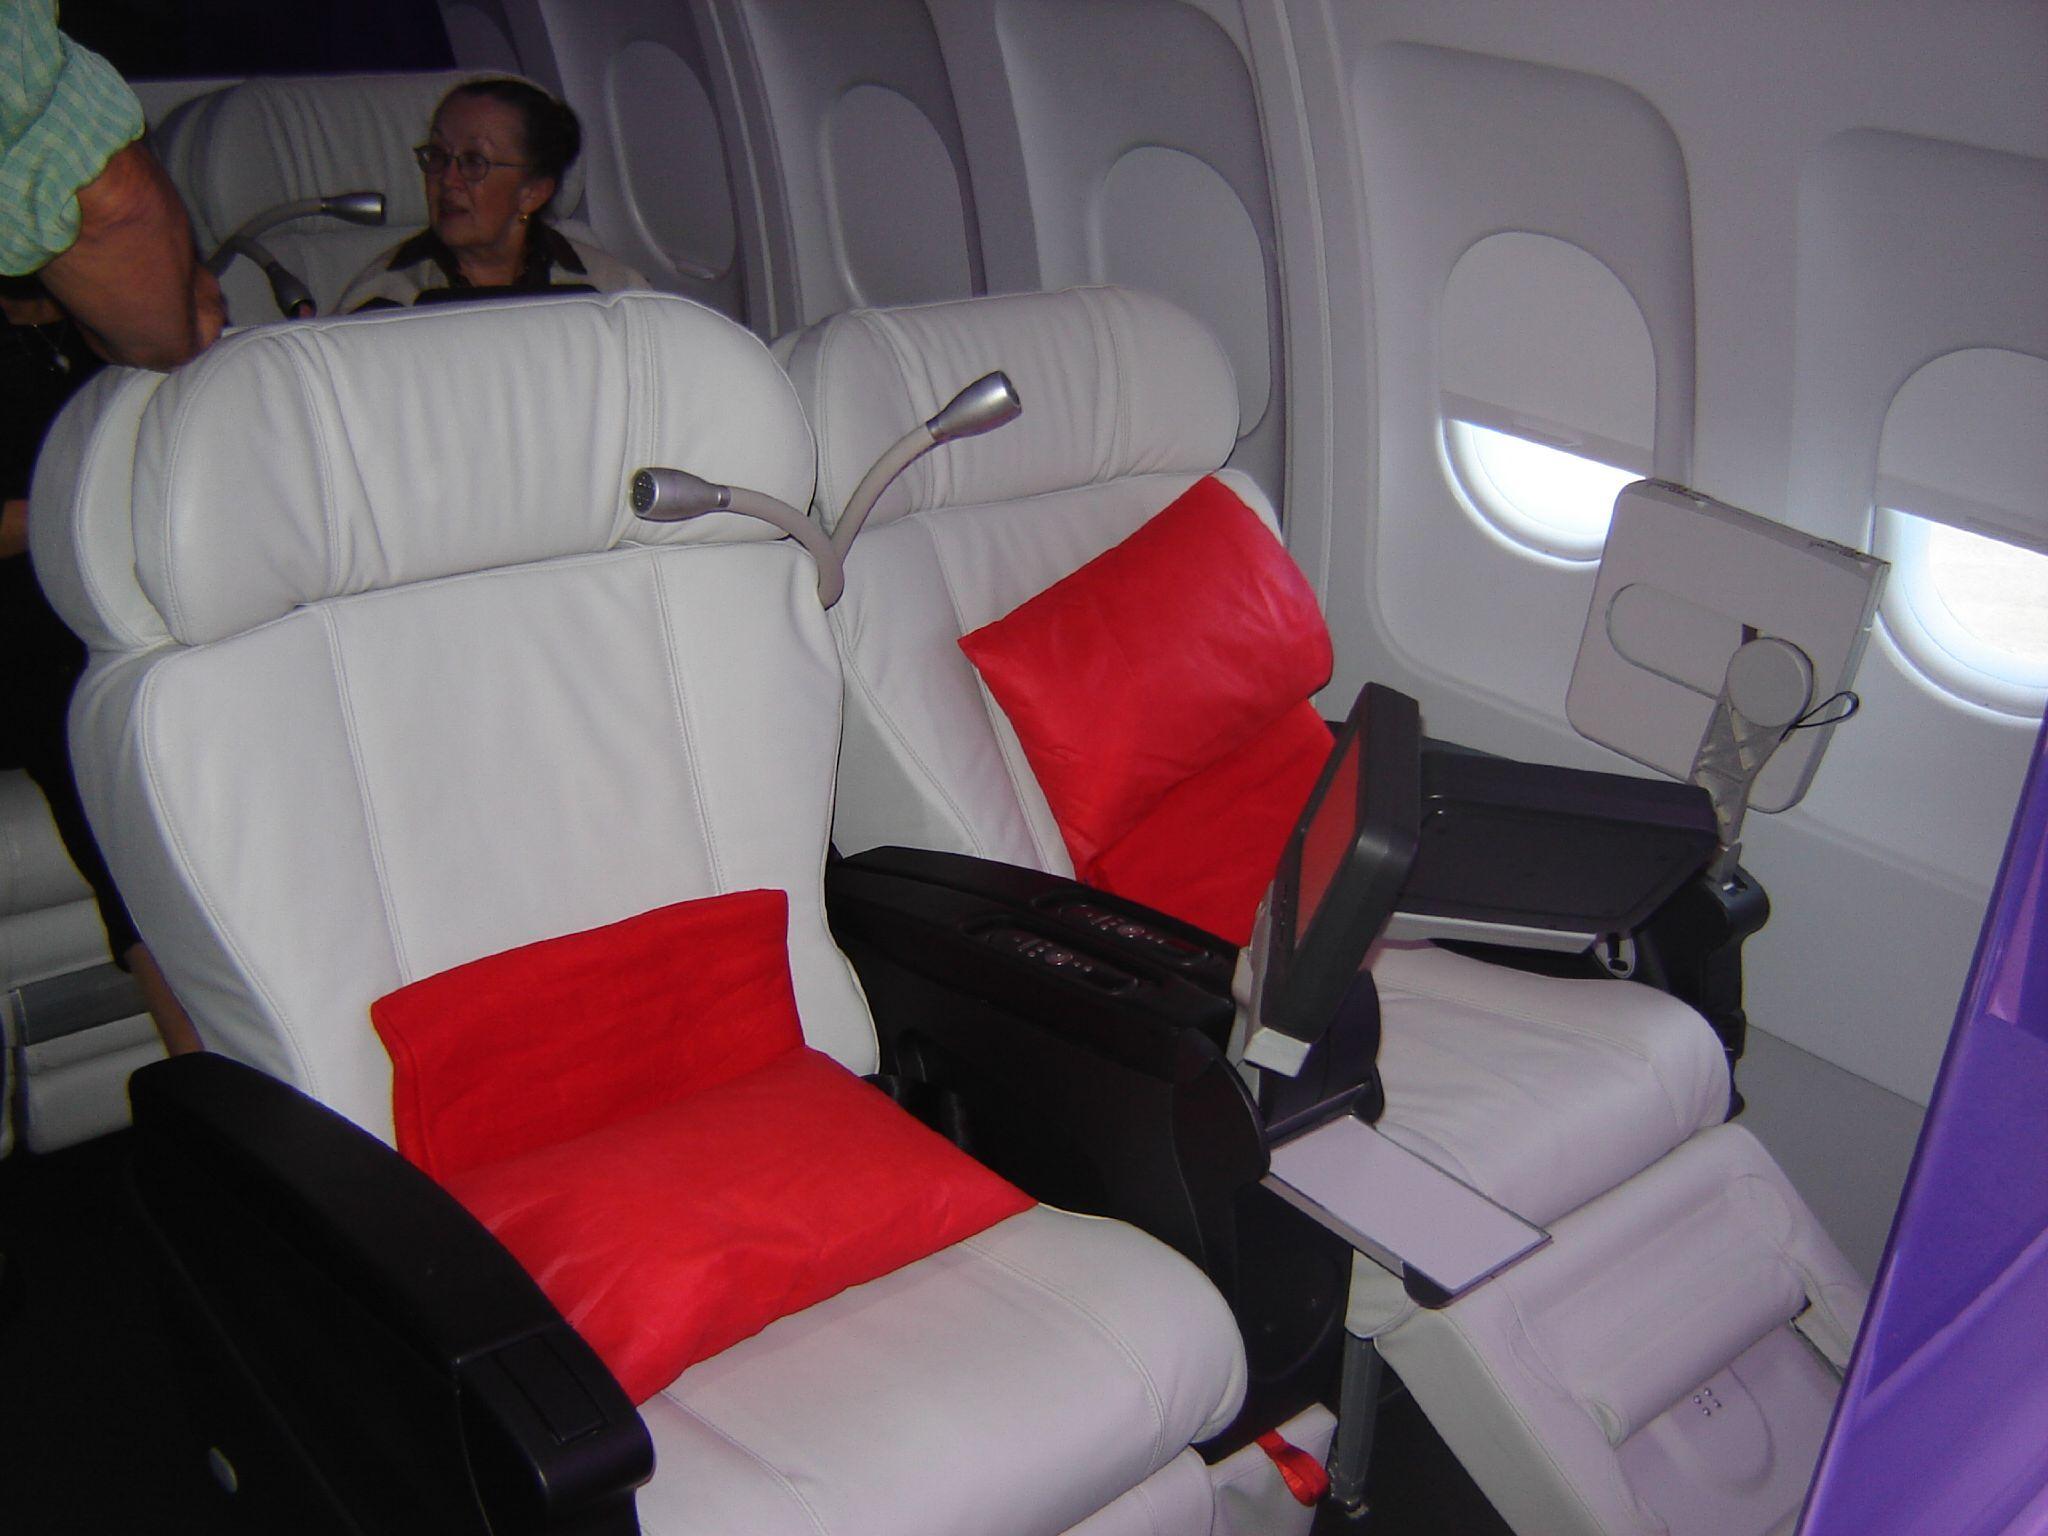 Virgin America File Virgin America First Class Jpg Wikipedia The Free Encyclopedia First Class Airline Flying First Class Virgin America